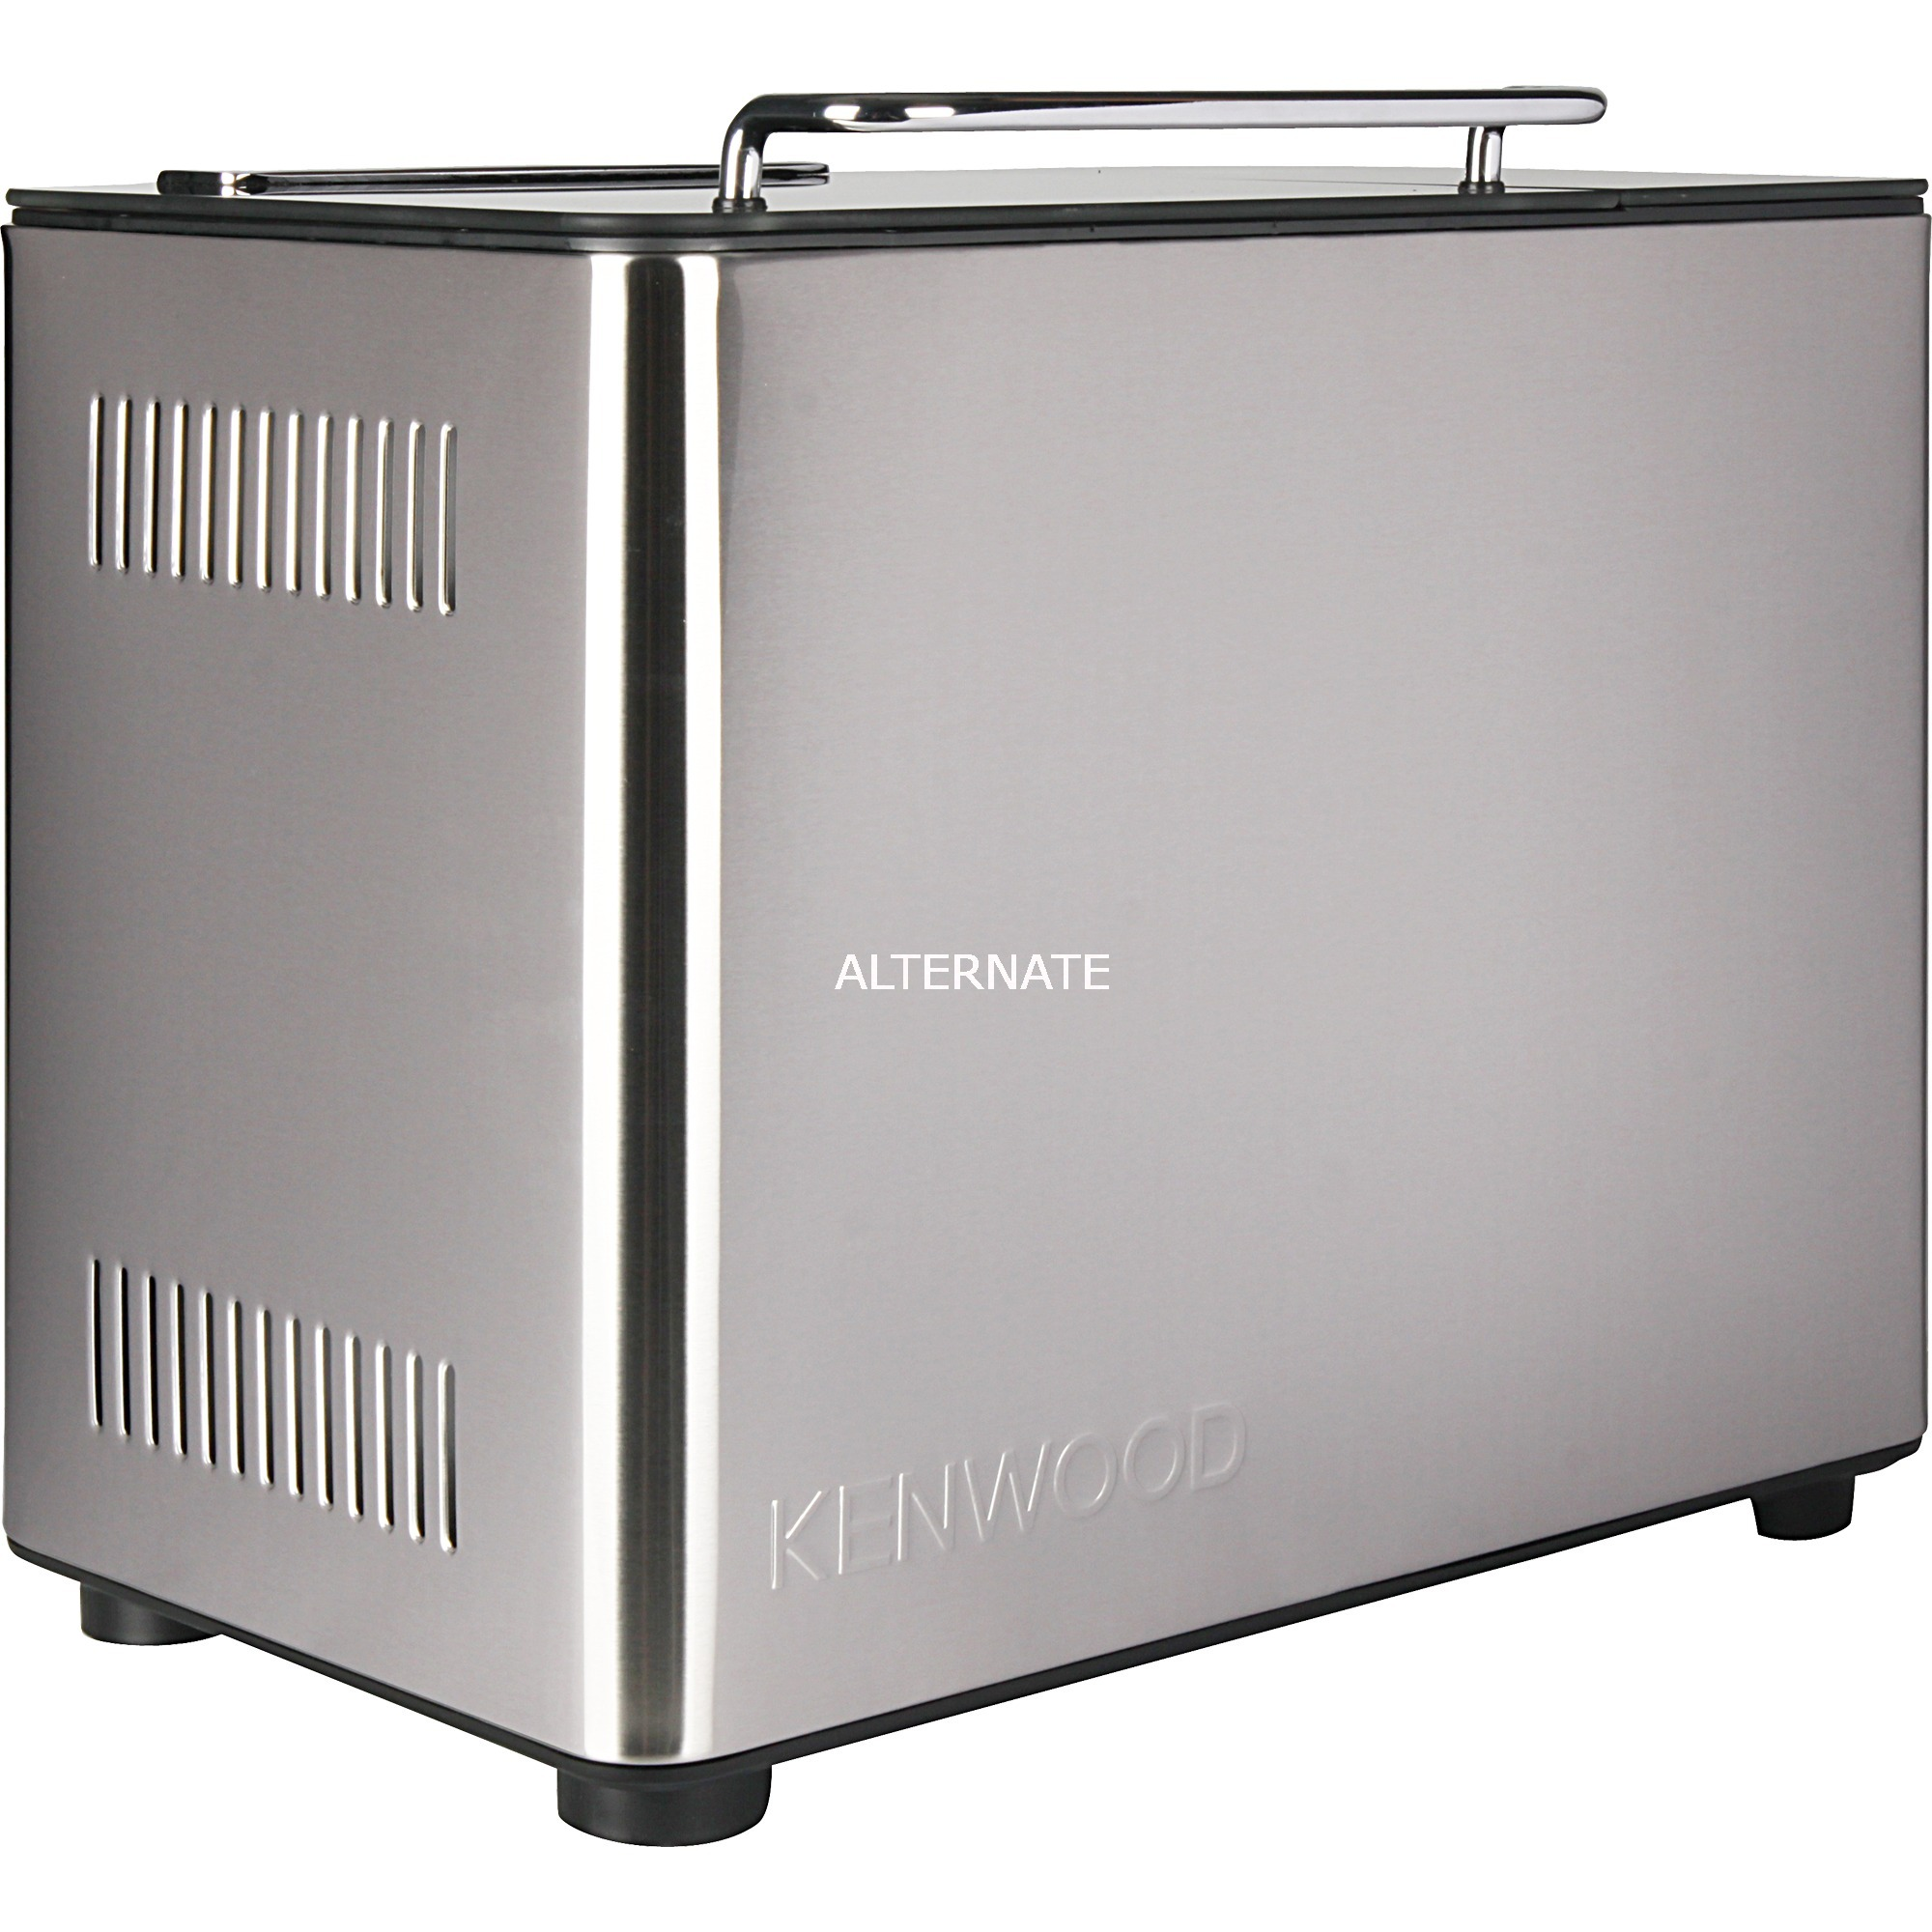 BM450 Aluminio, Negro 780W panificadora